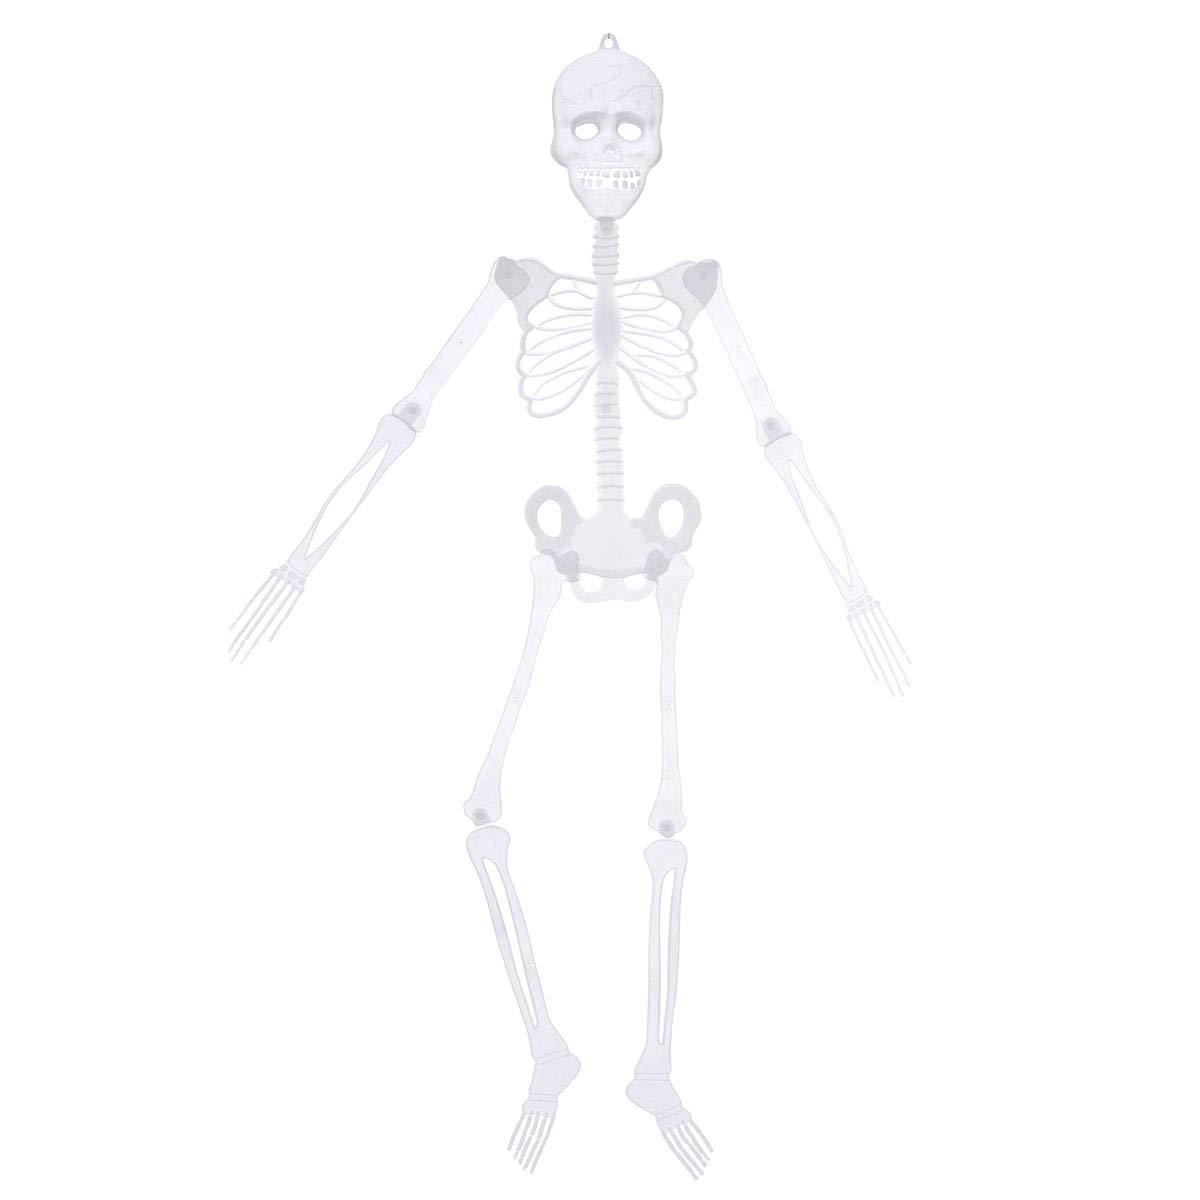 Halloween Luminou Human Skeleton Decoration Classroom Occasionally Adjustable - 1PCs by Unknown (Image #1)